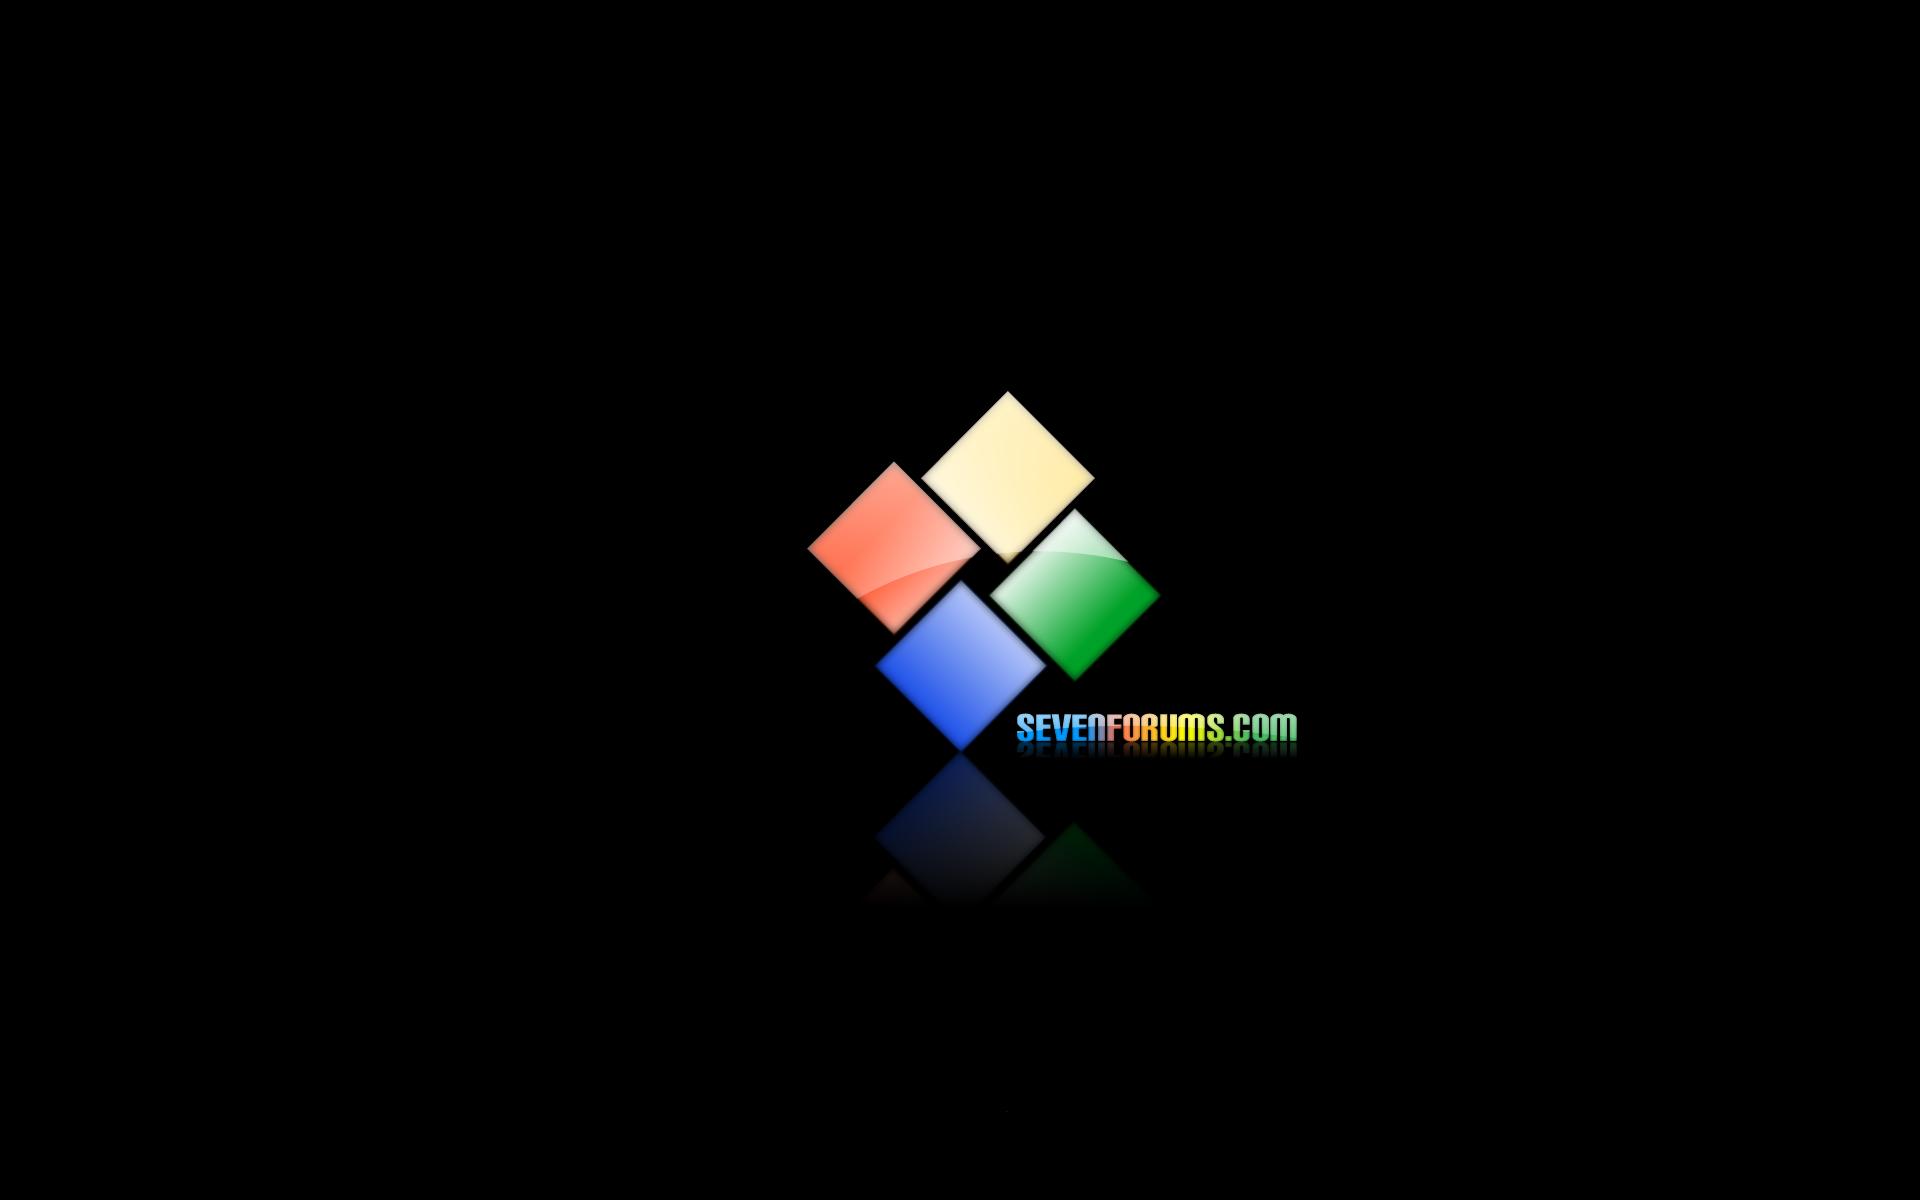 Custom Windows 7 Wallpapers [continued]   Page 73   Windows 7 Help 1920x1200